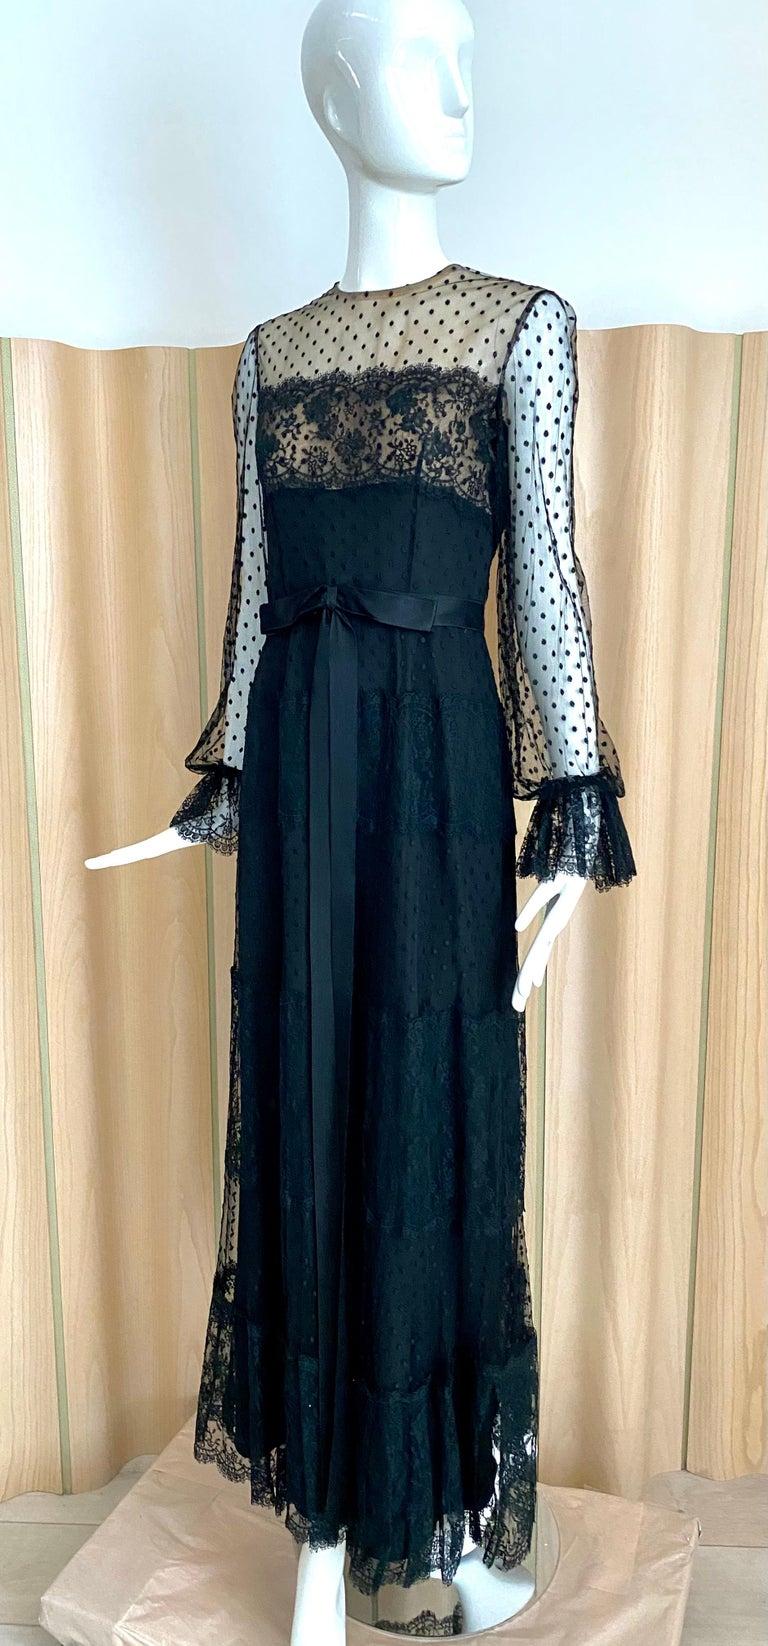 1970s BILL BLASS Black Long Sleeve Silk Dress For Sale 1